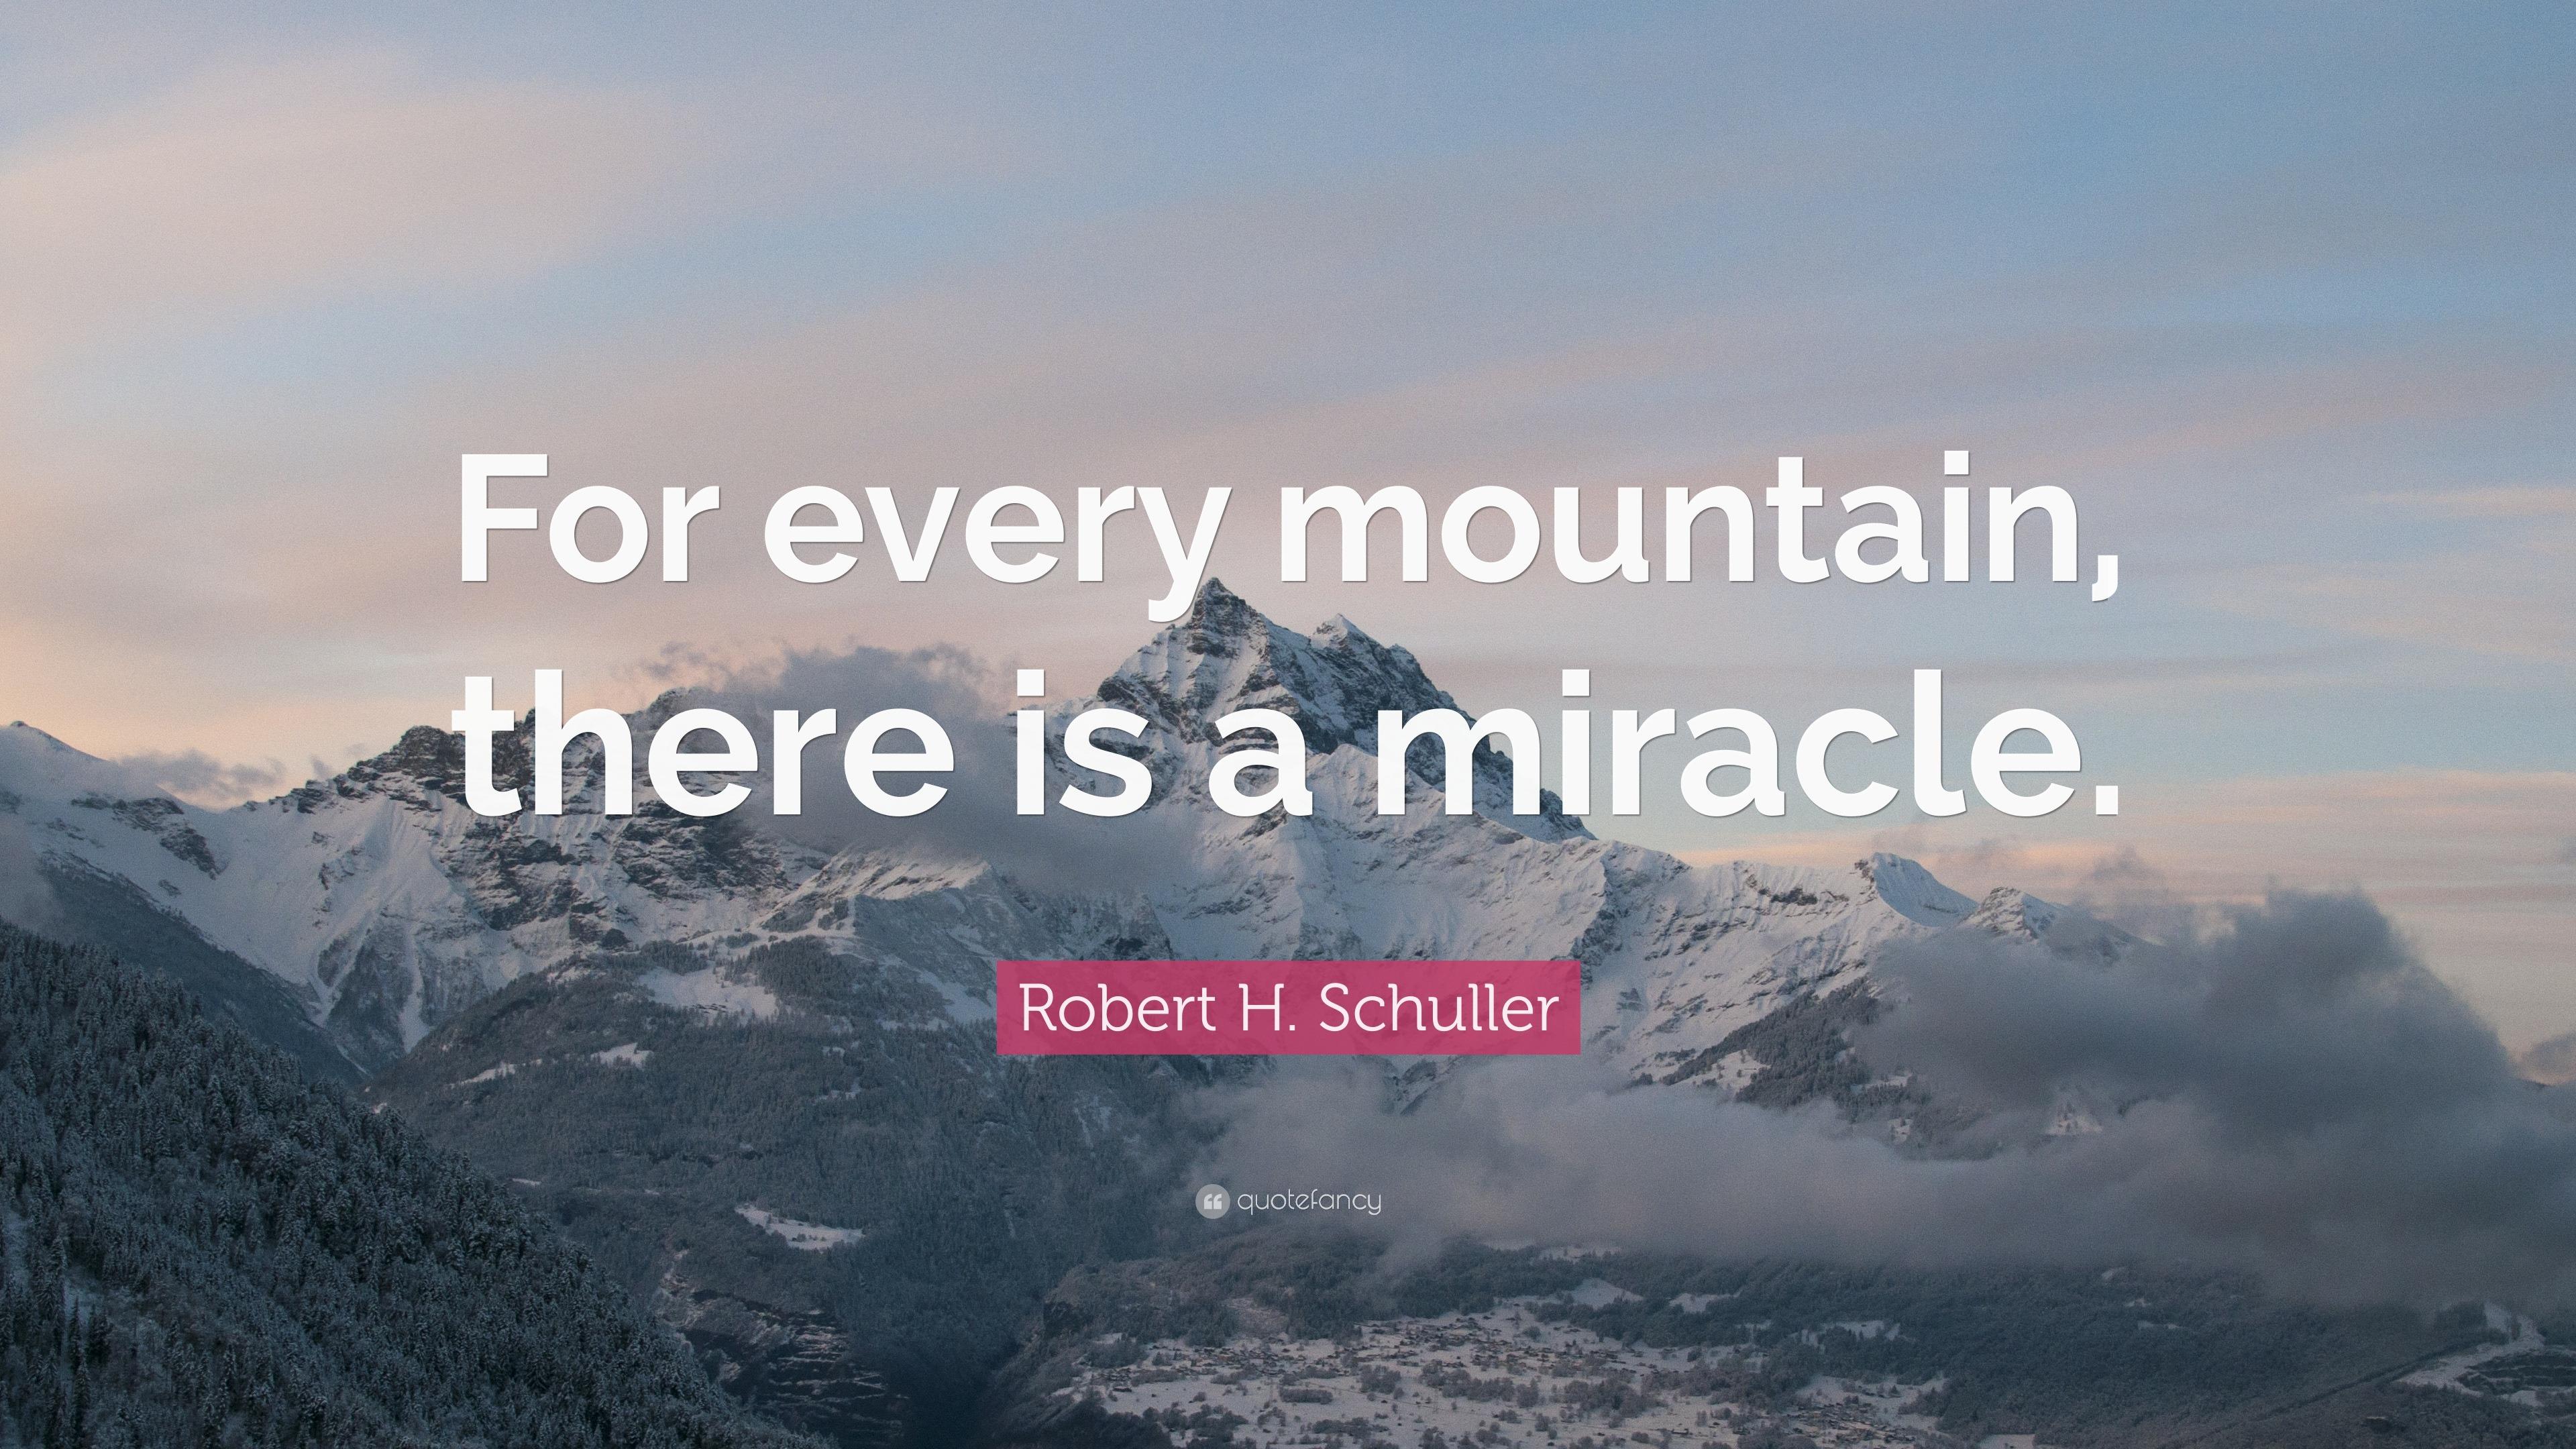 Robert H. Schuller Quotes (100 Wallpapers)